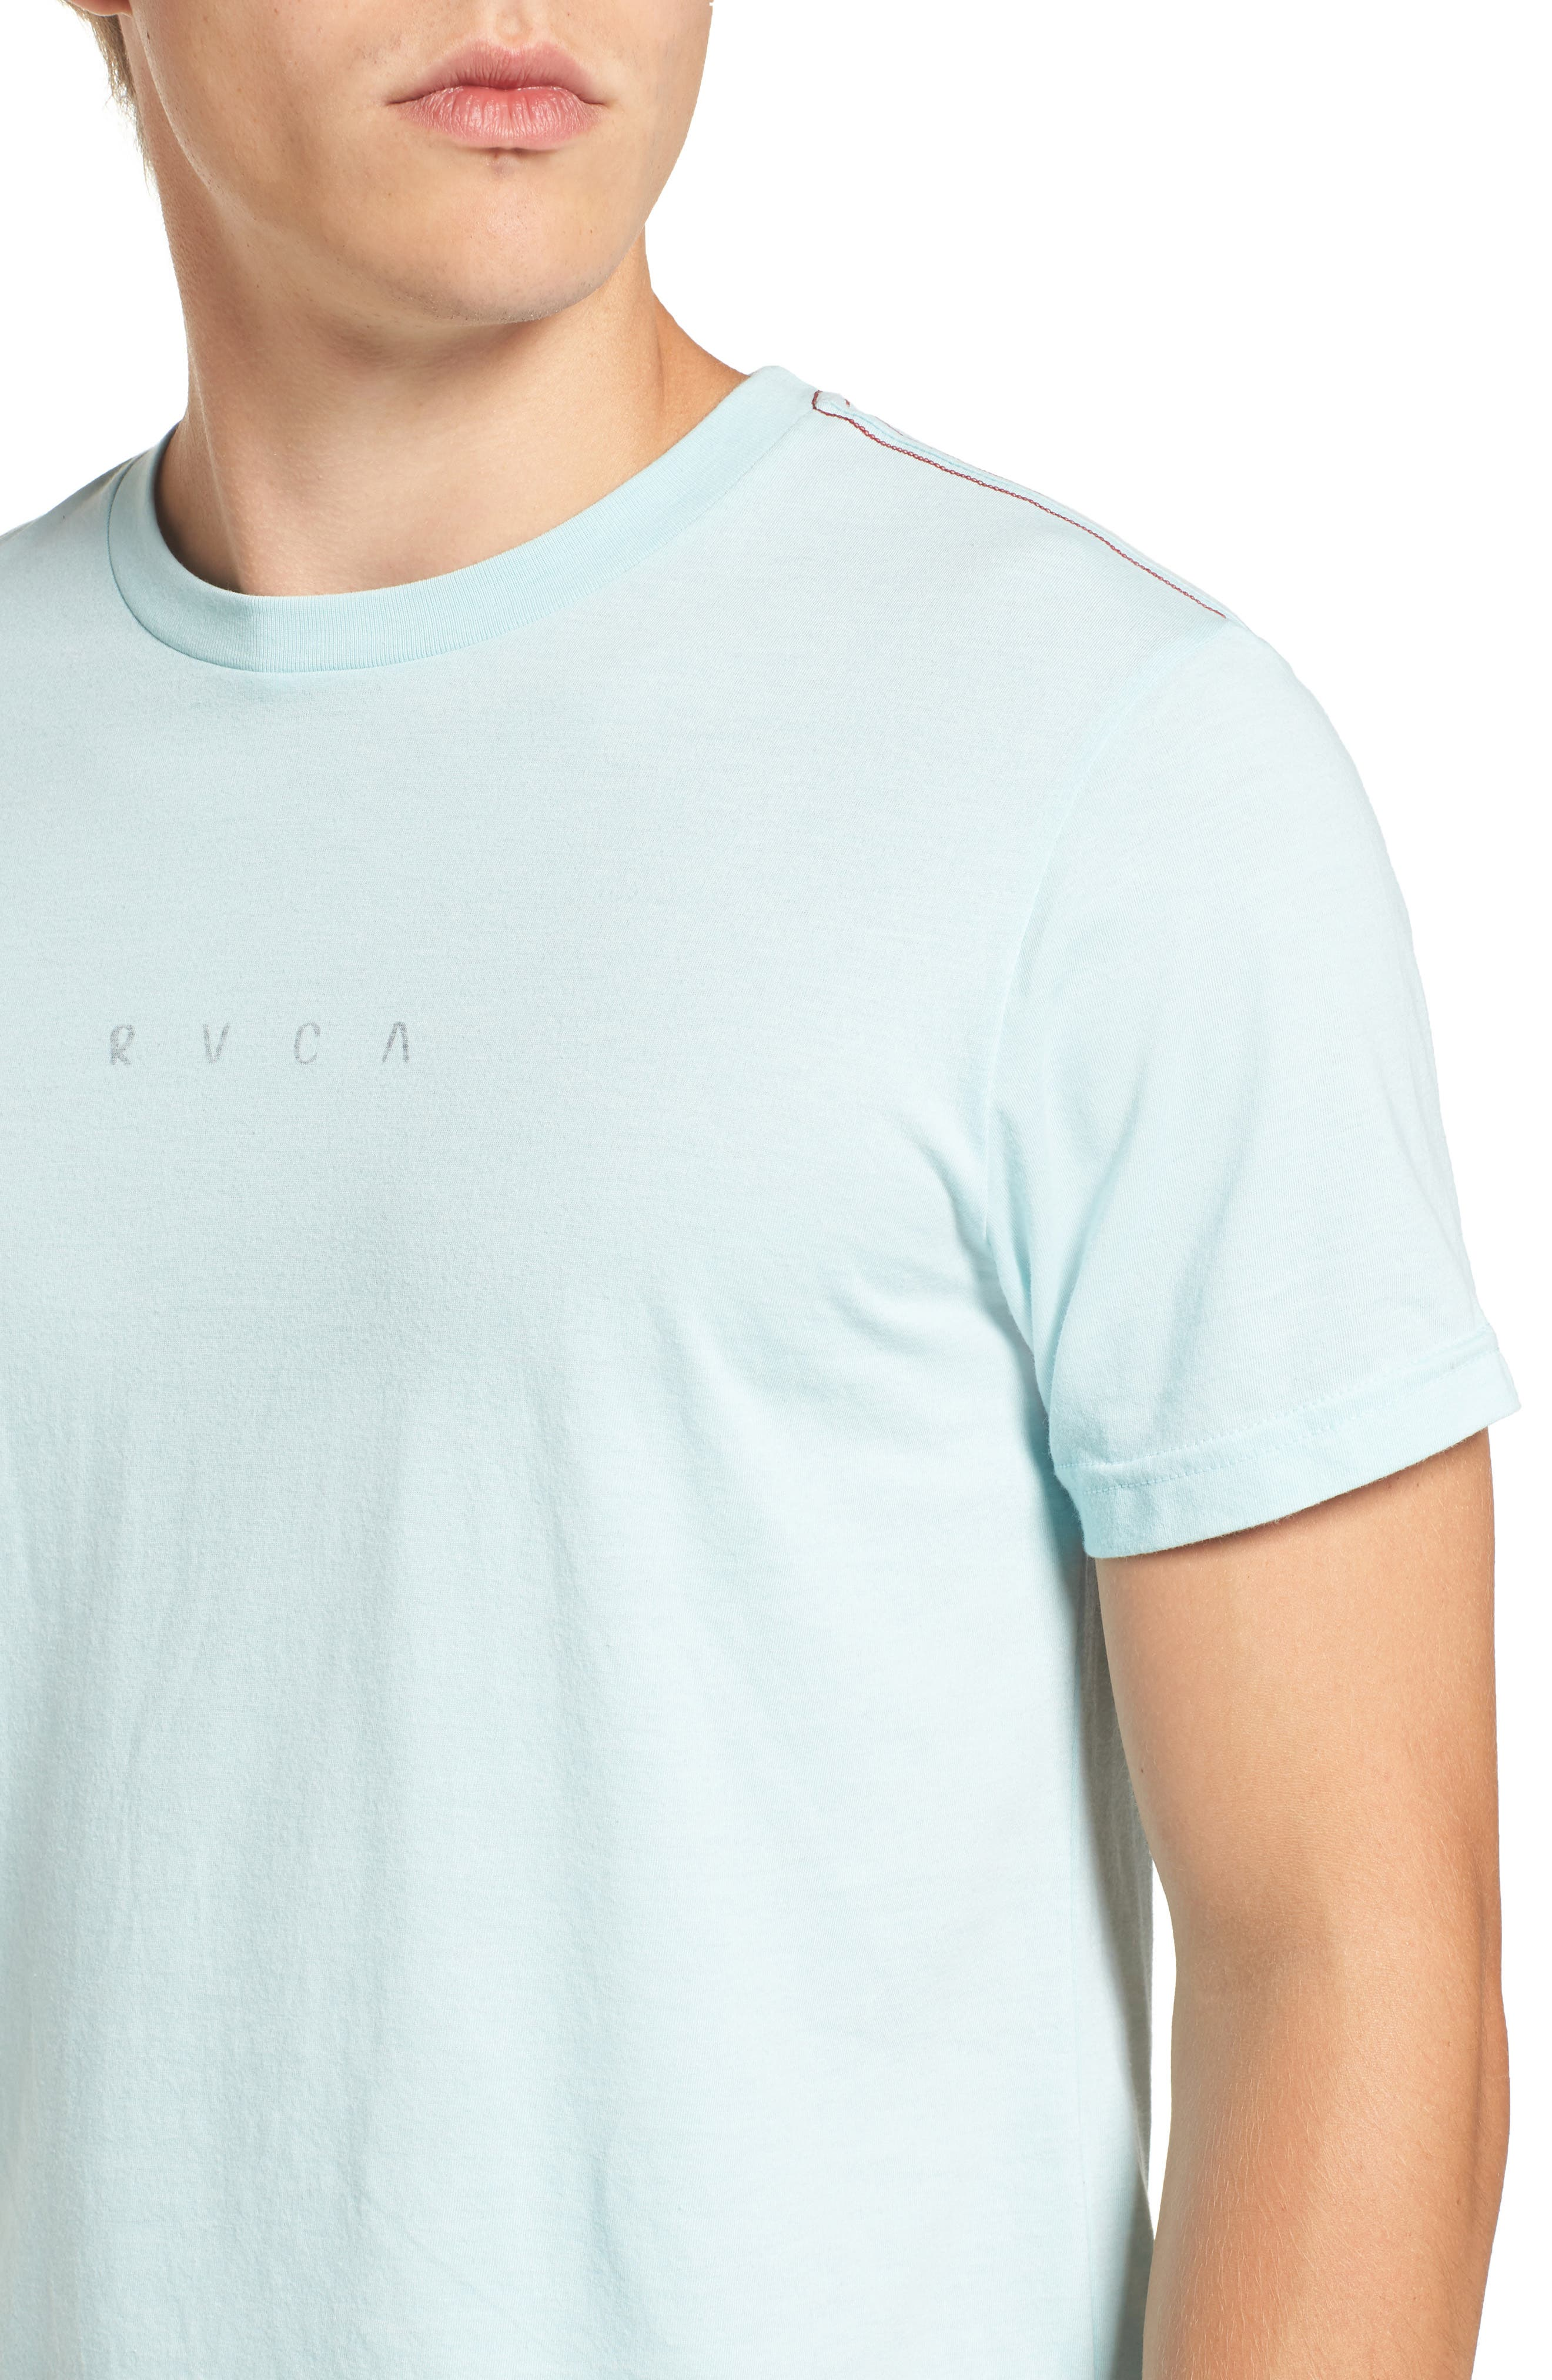 Snooze Cloud Graphic T-Shirt,                             Alternate thumbnail 8, color,